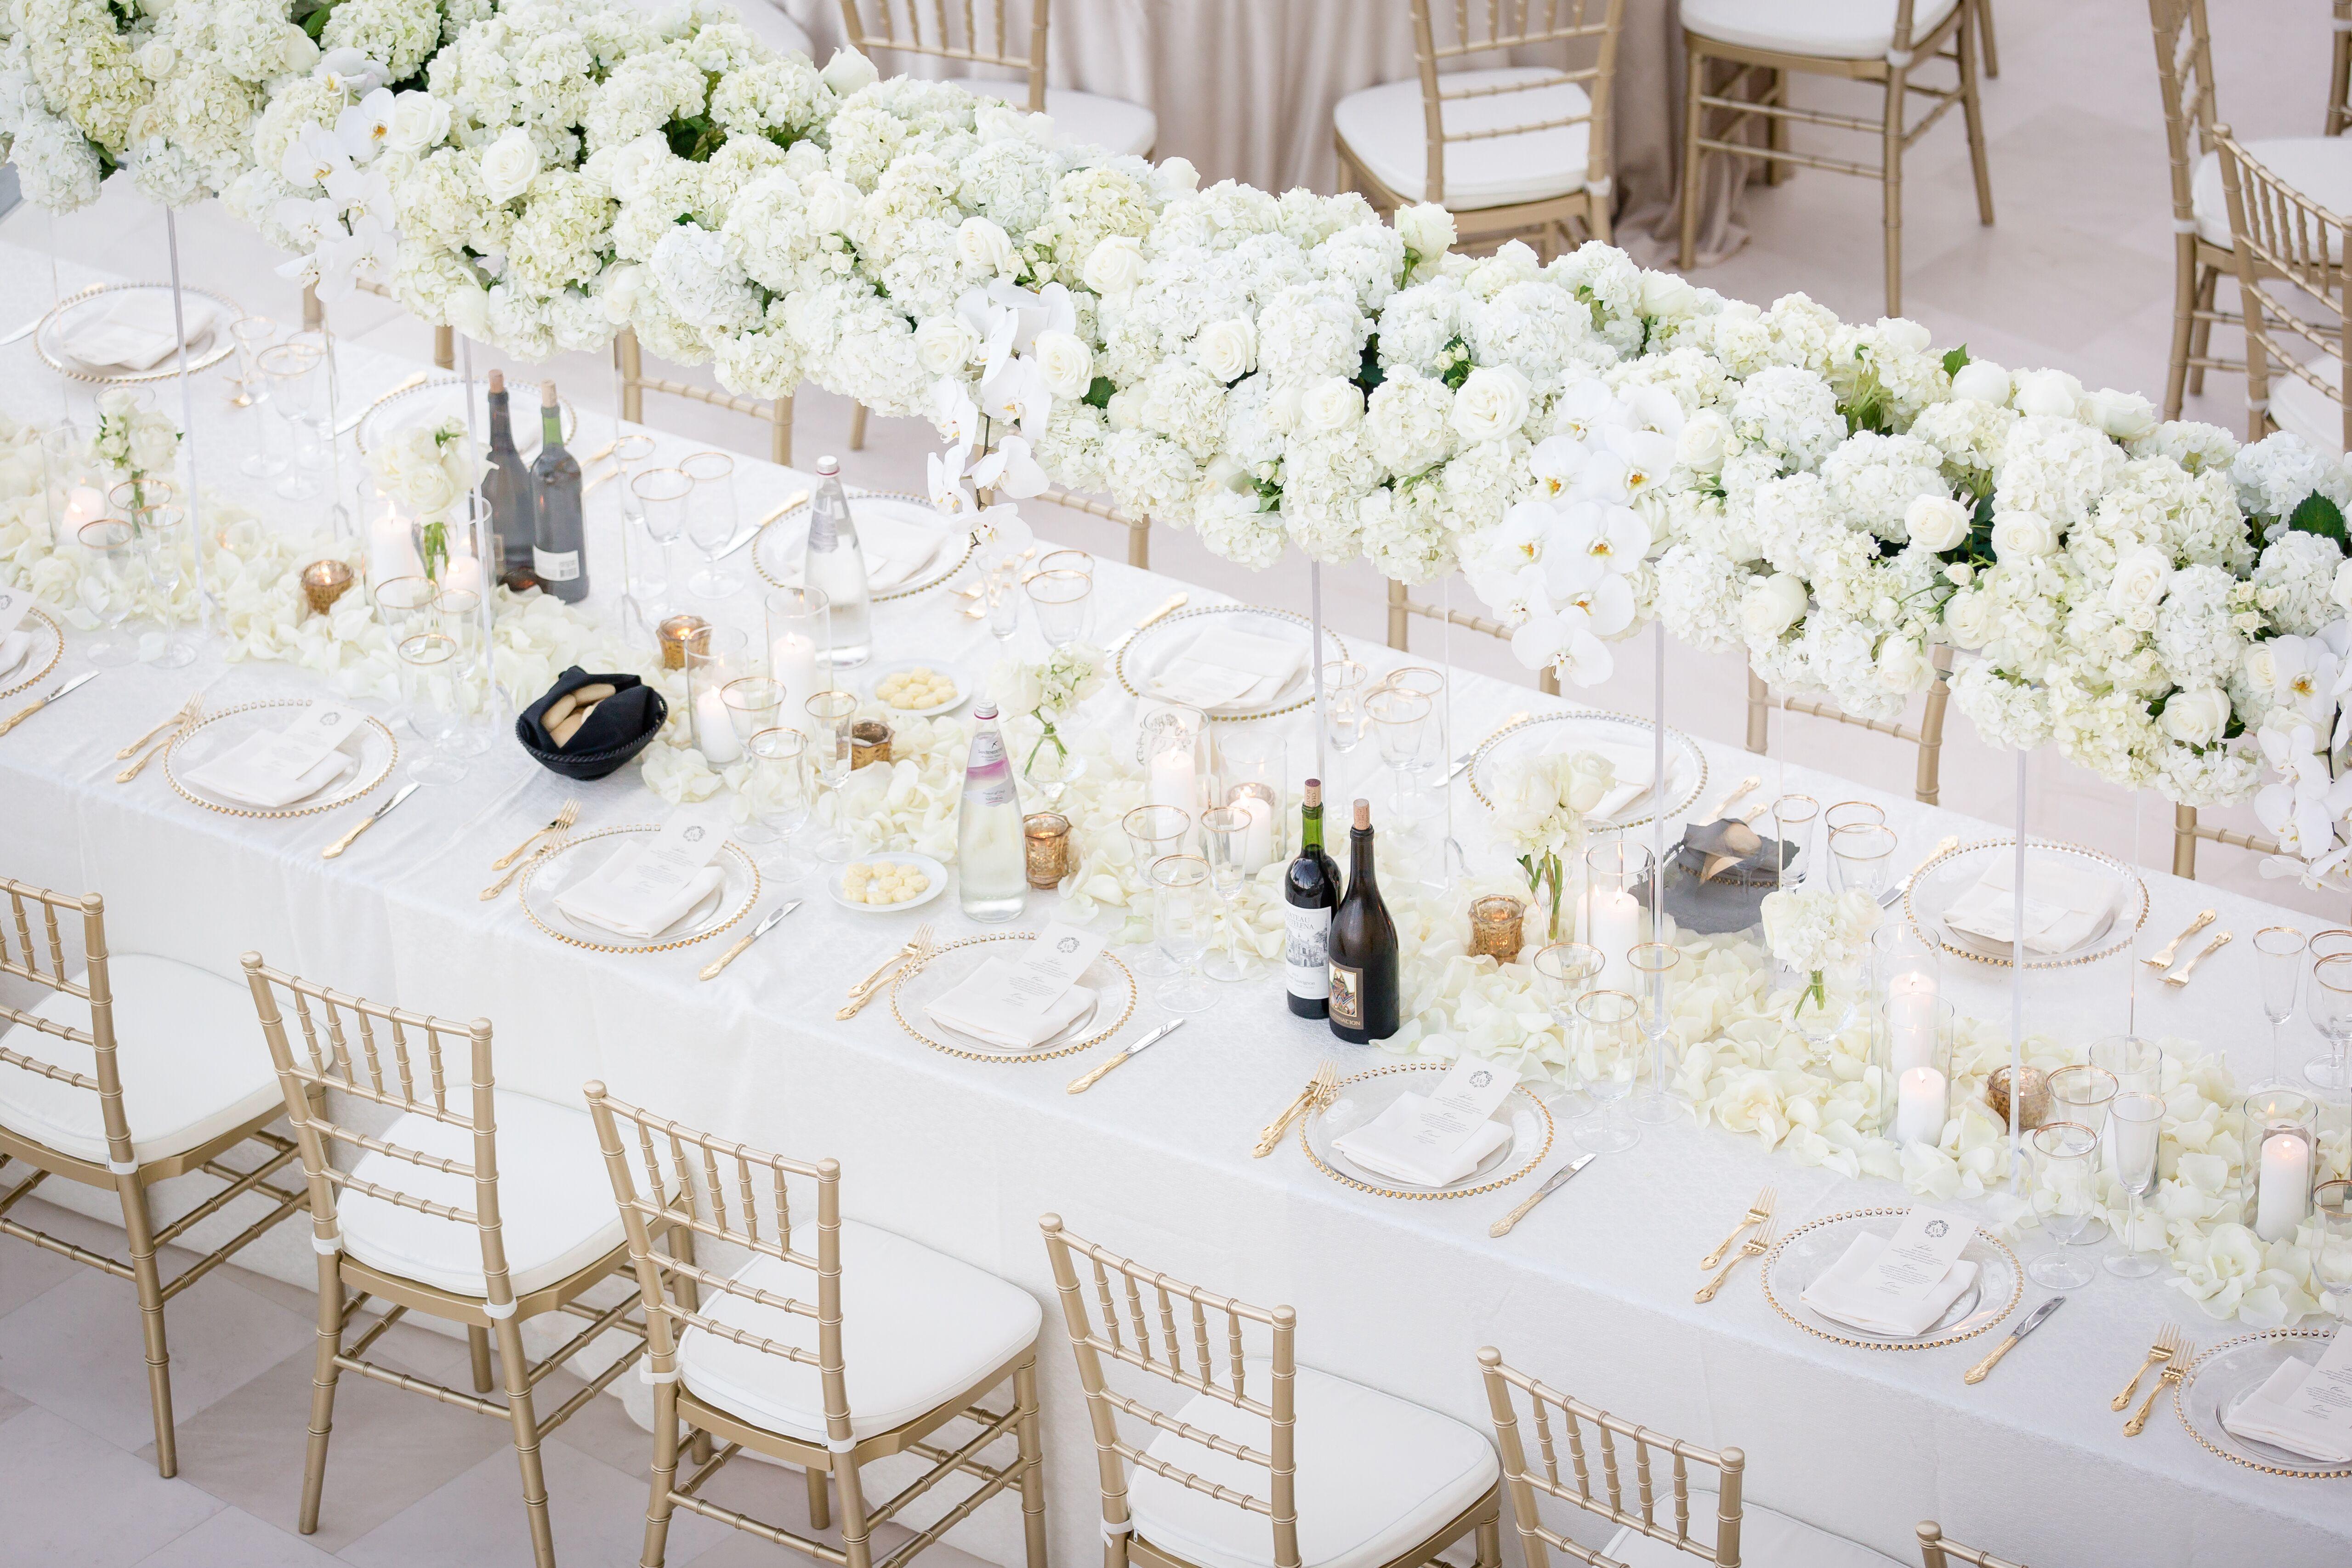 All-White Wedding Reception